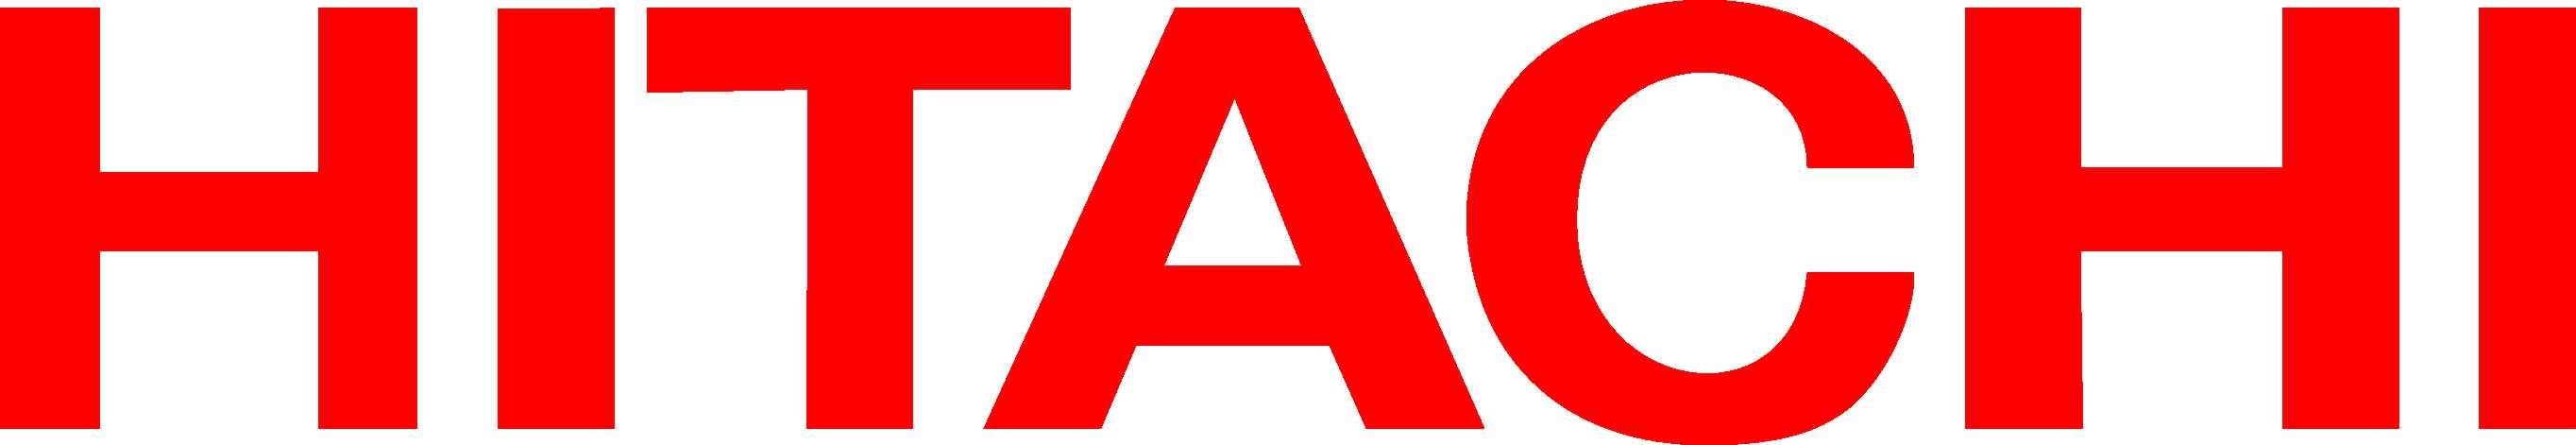 hitachi construction logo. hitachi construction logo